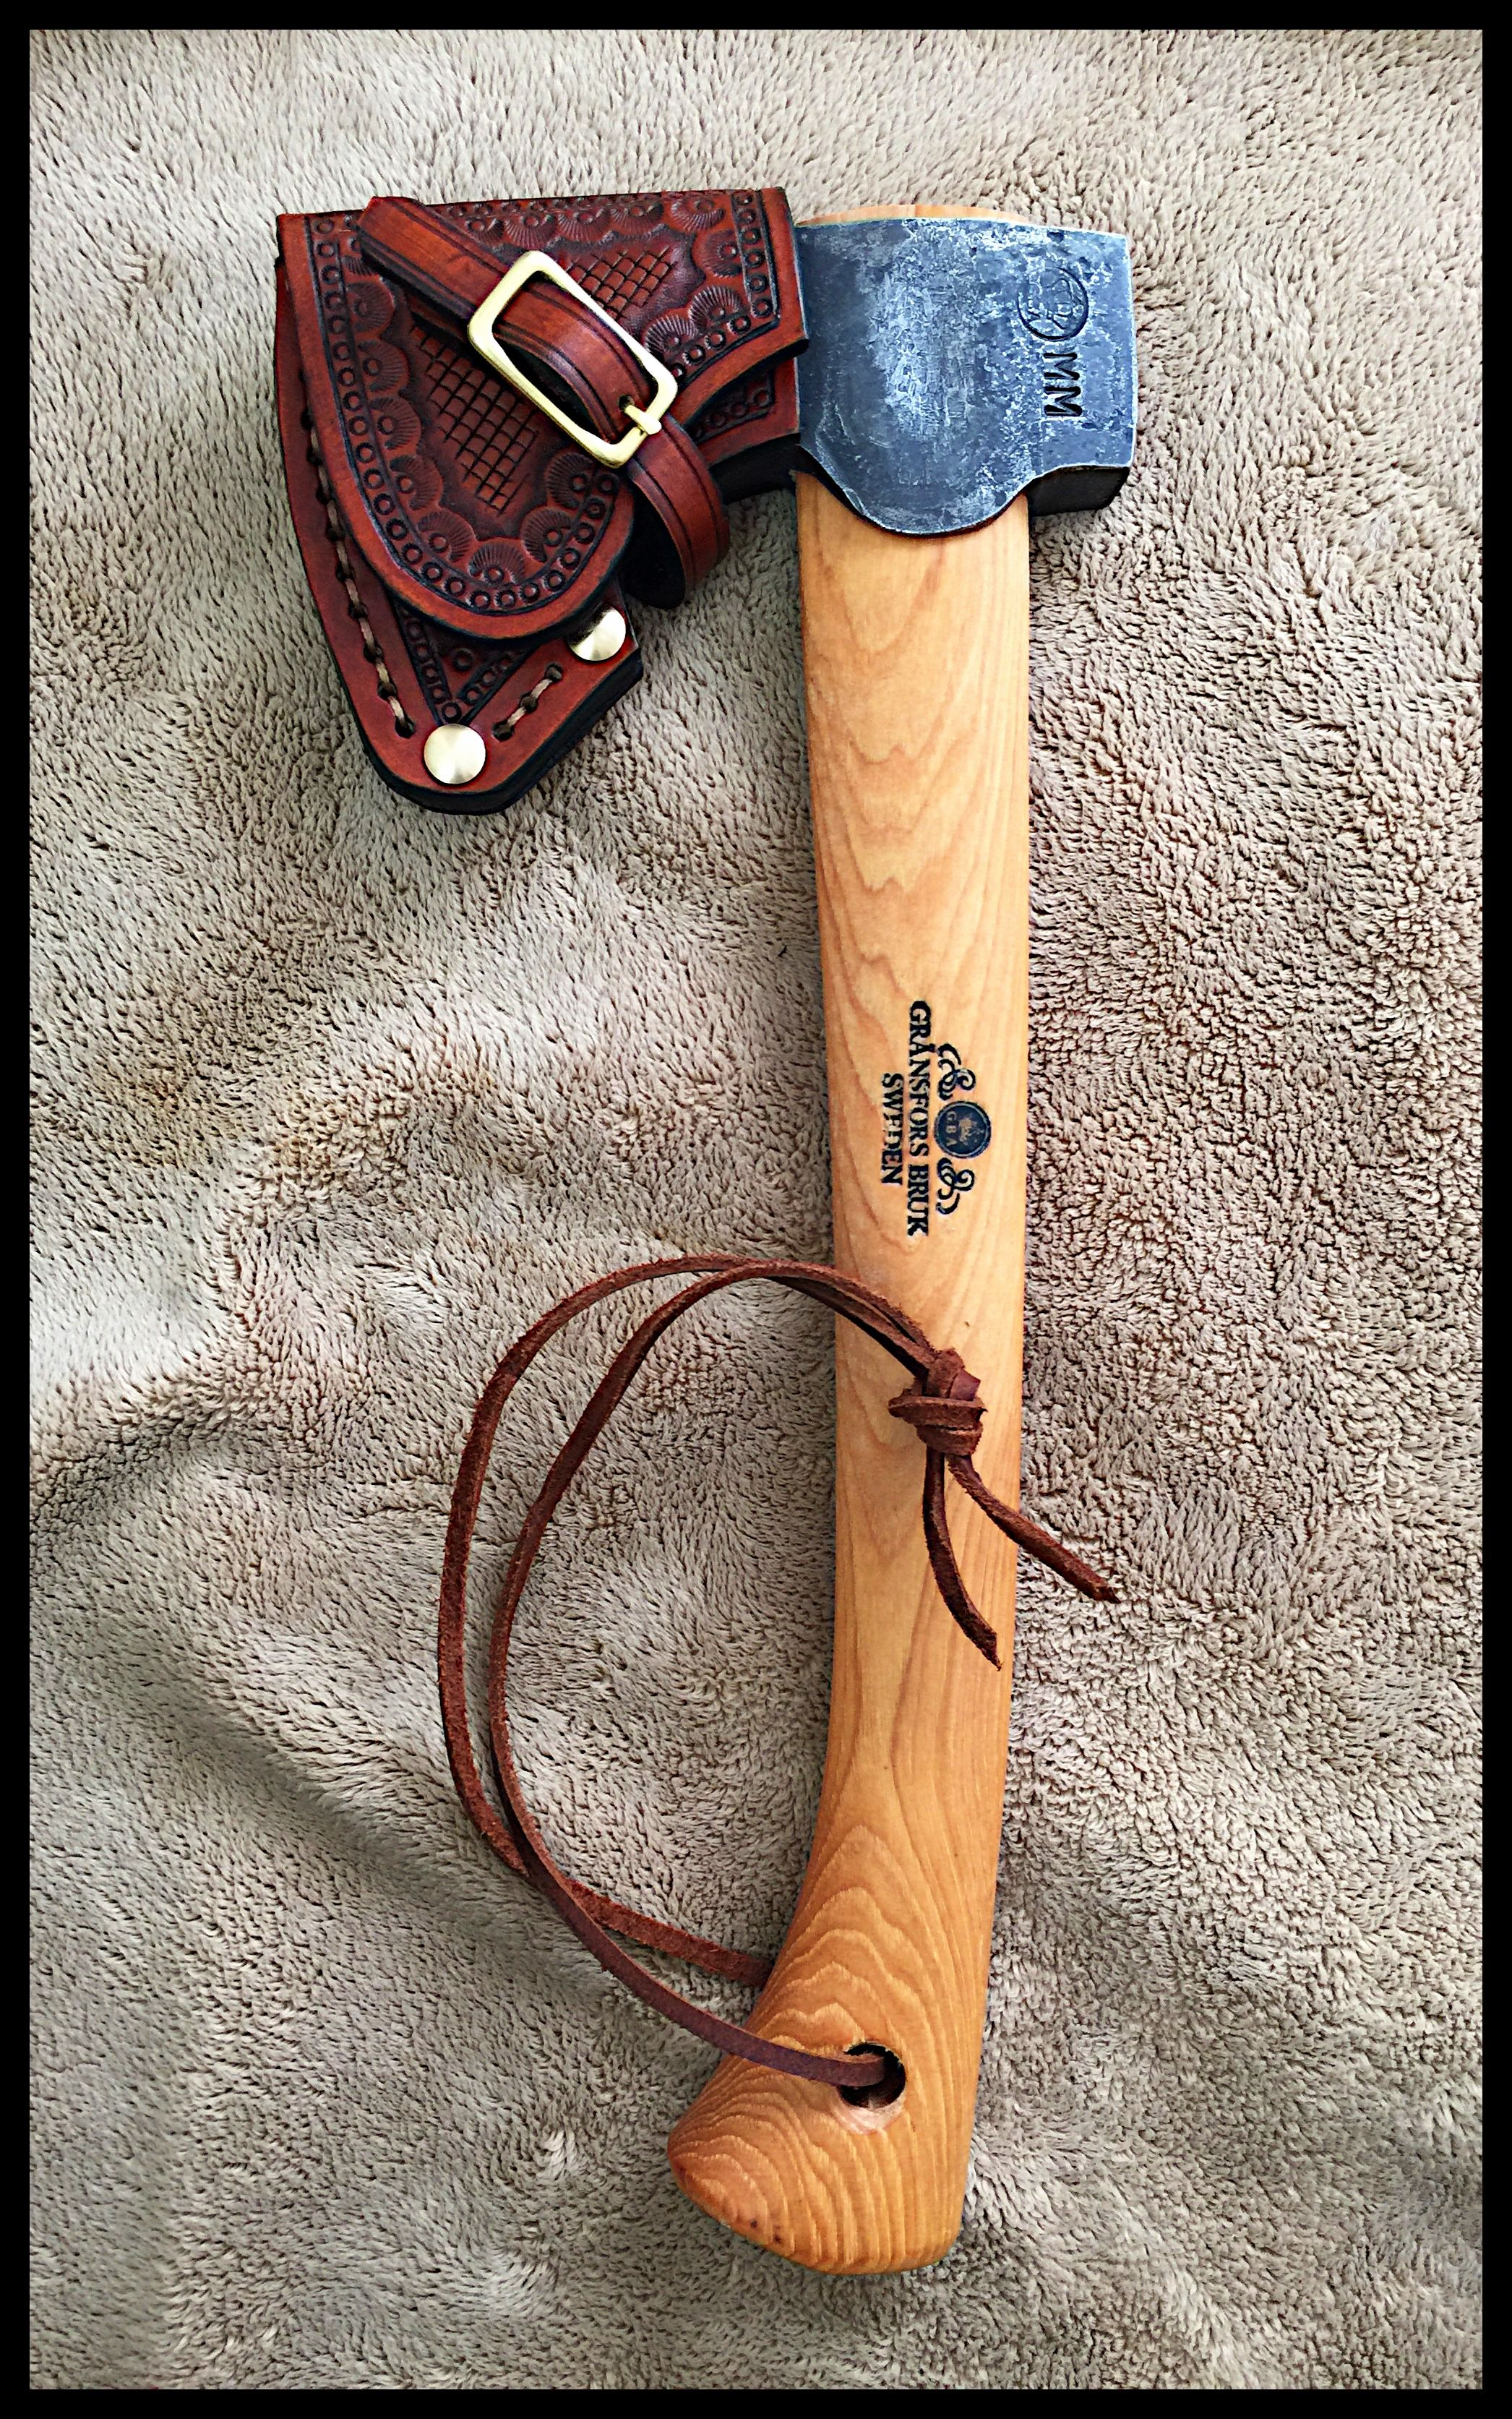 Gransfors Bruks Wildlife Hatchet #415 with Custom Leather Sheath by